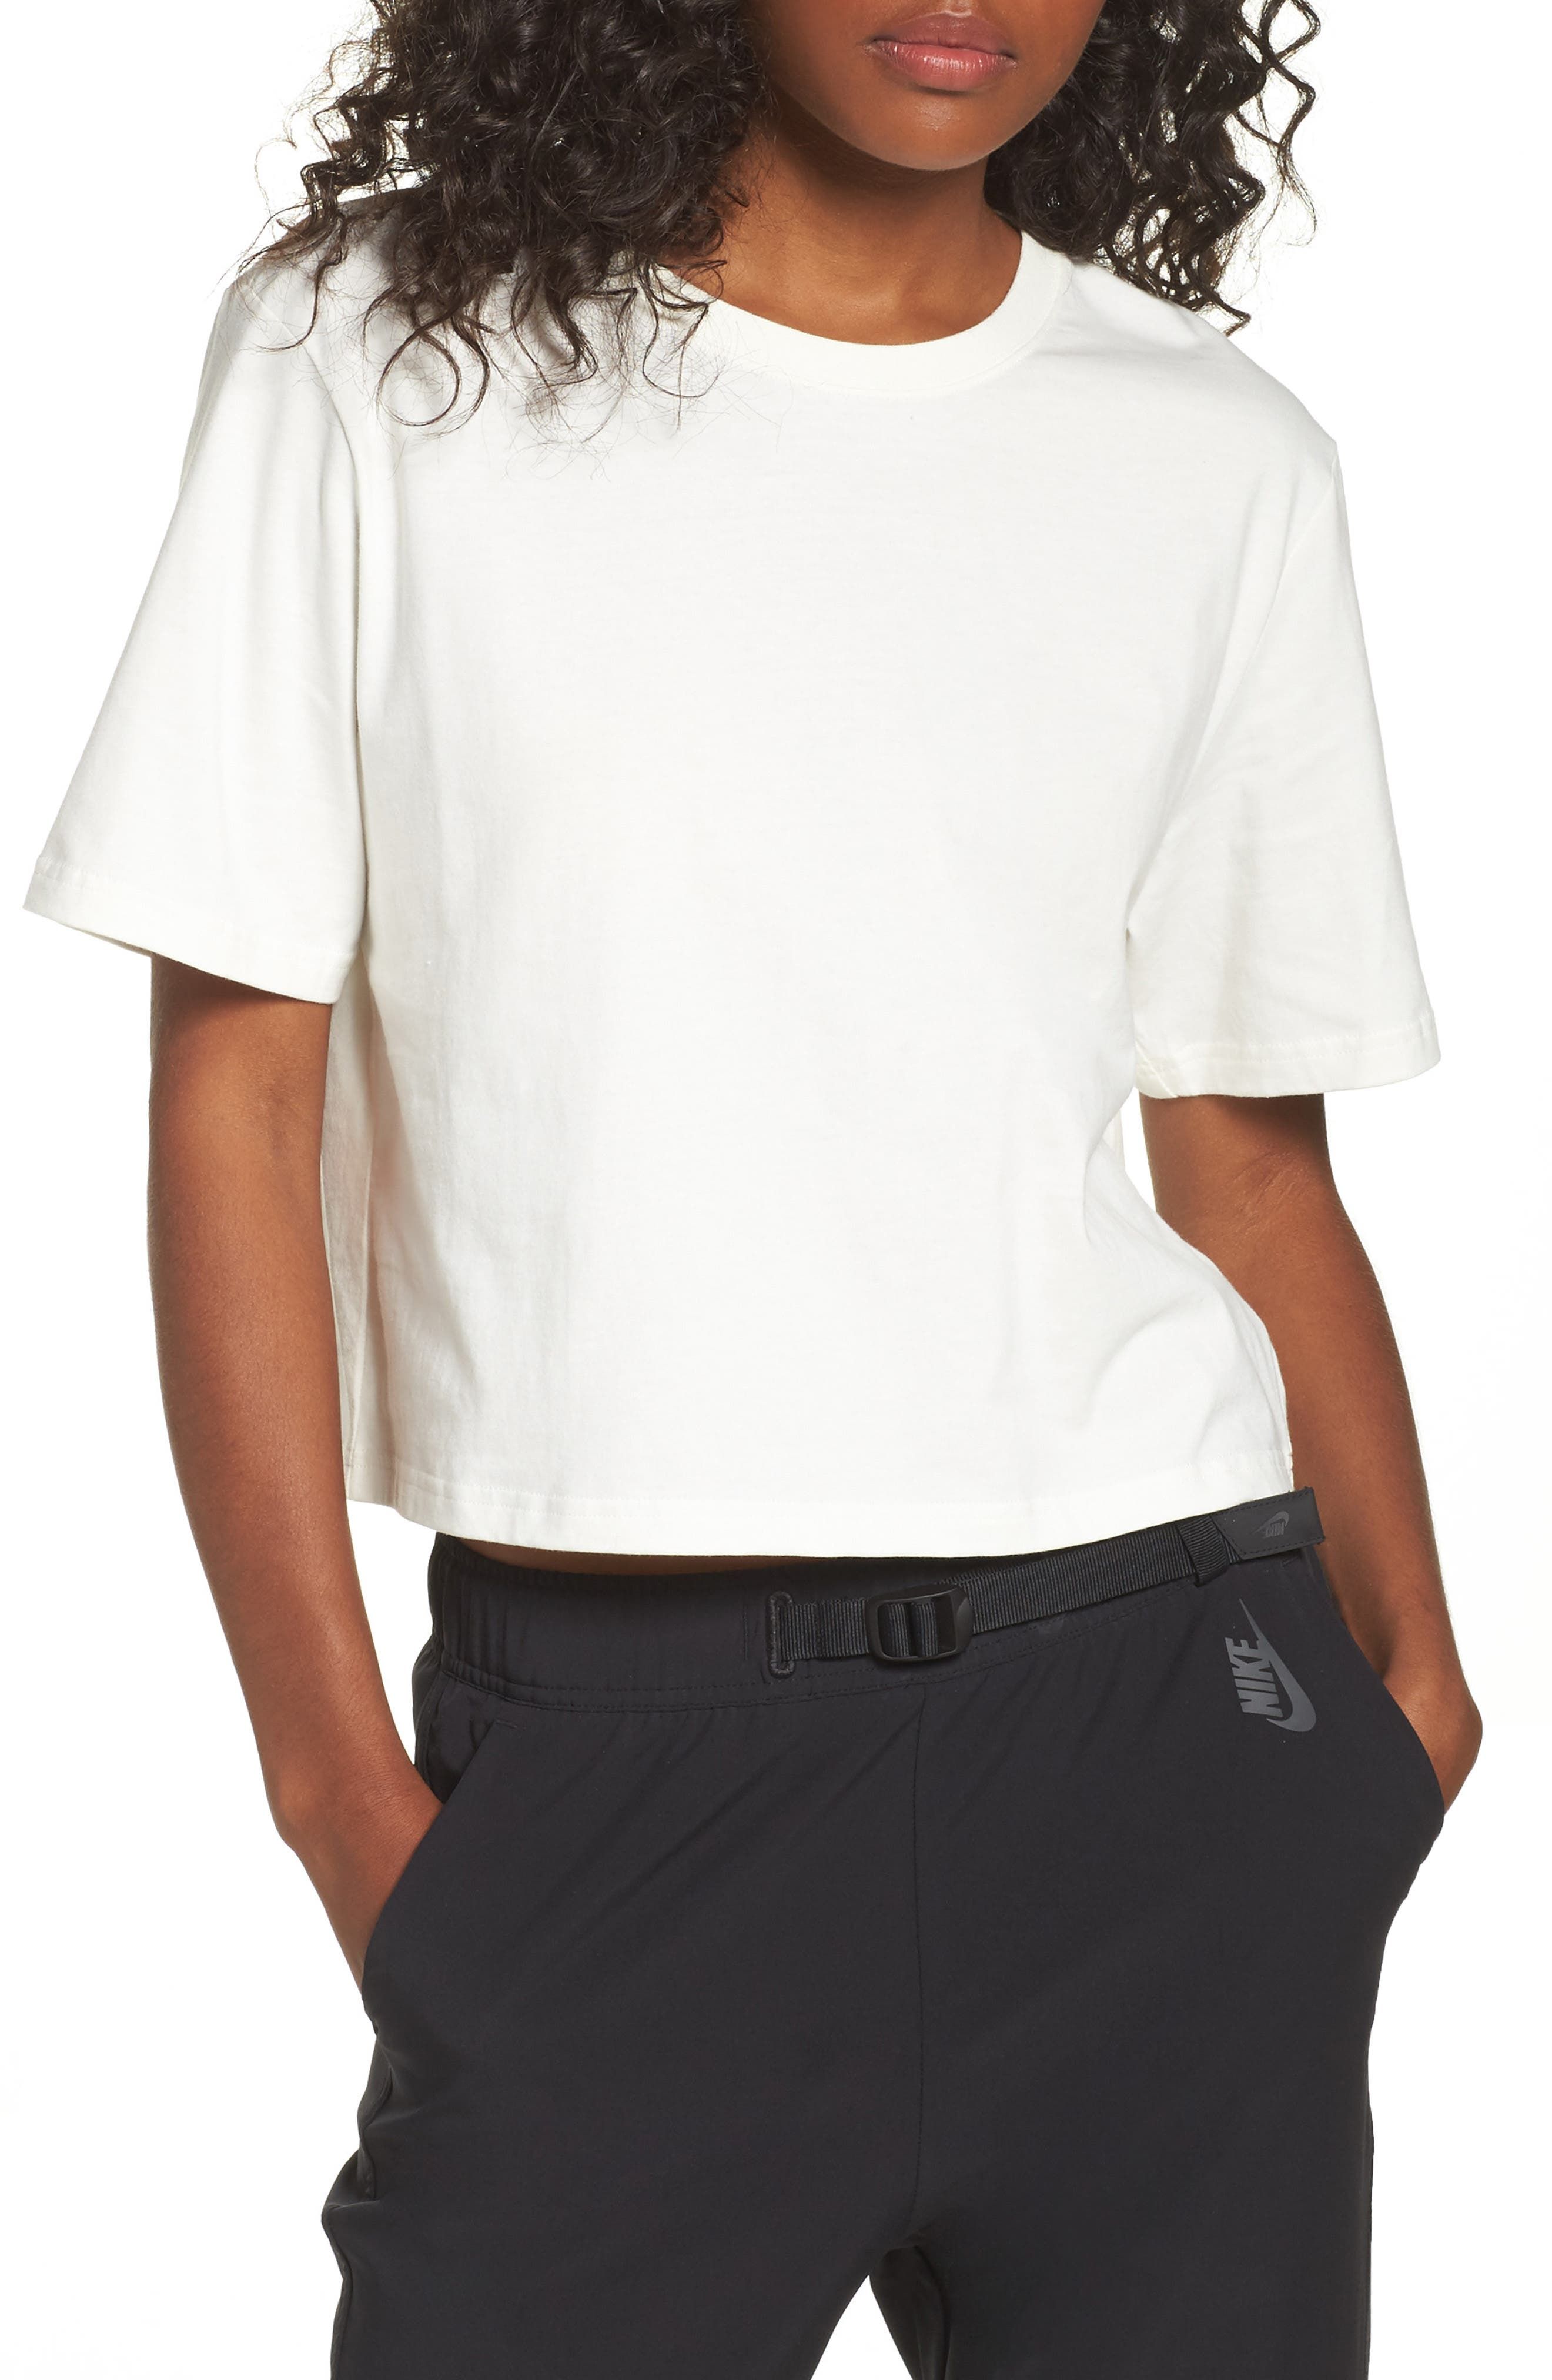 NikeLab Essentials Tee,                         Main,                         color, Sail/ Black